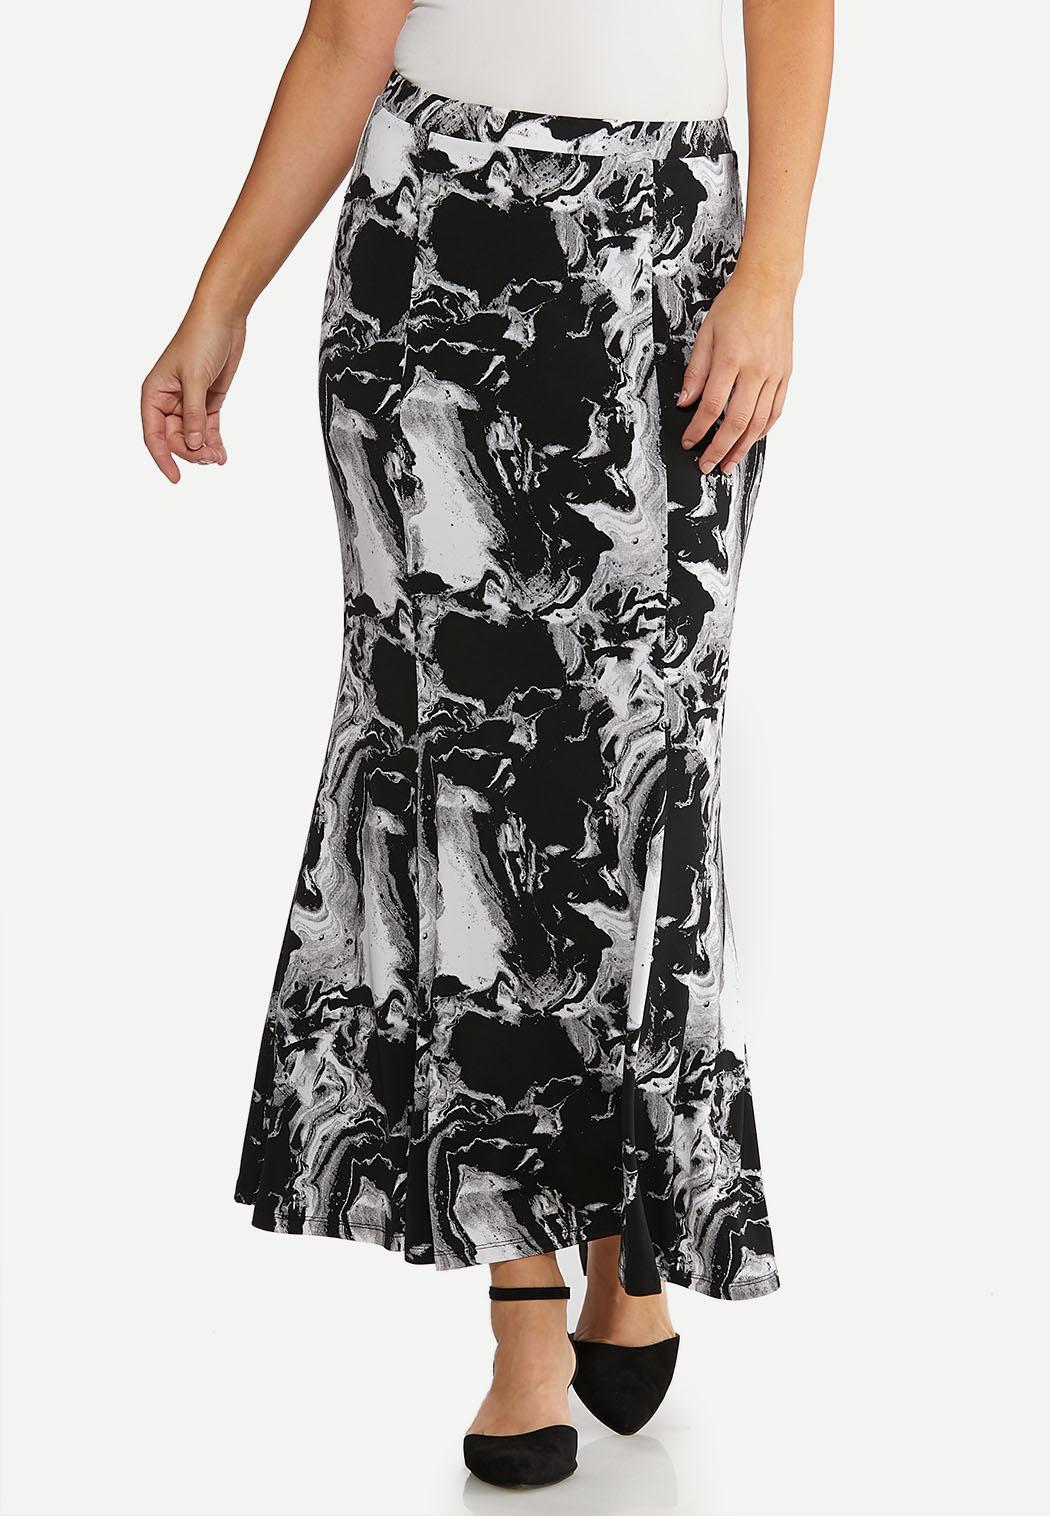 Petite Marble Maxi Skirt